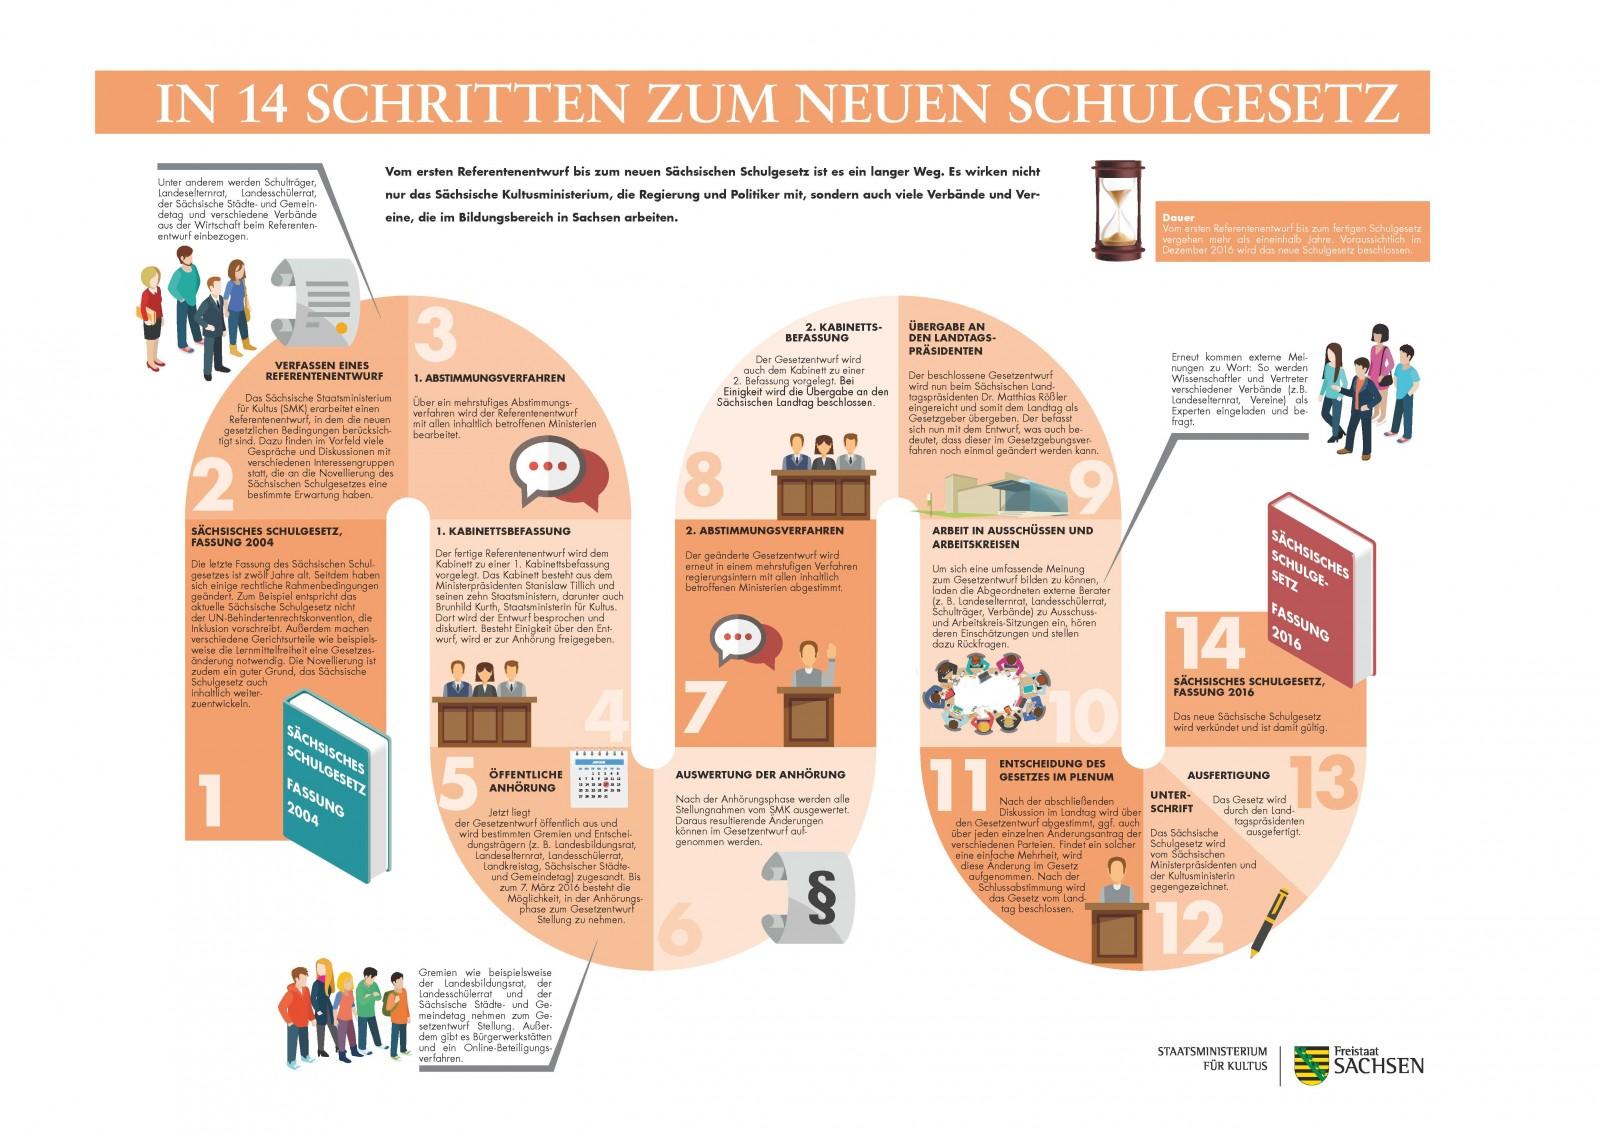 sgn_klasse_1_2016_infografik_A3_300dpi_2016_01_18